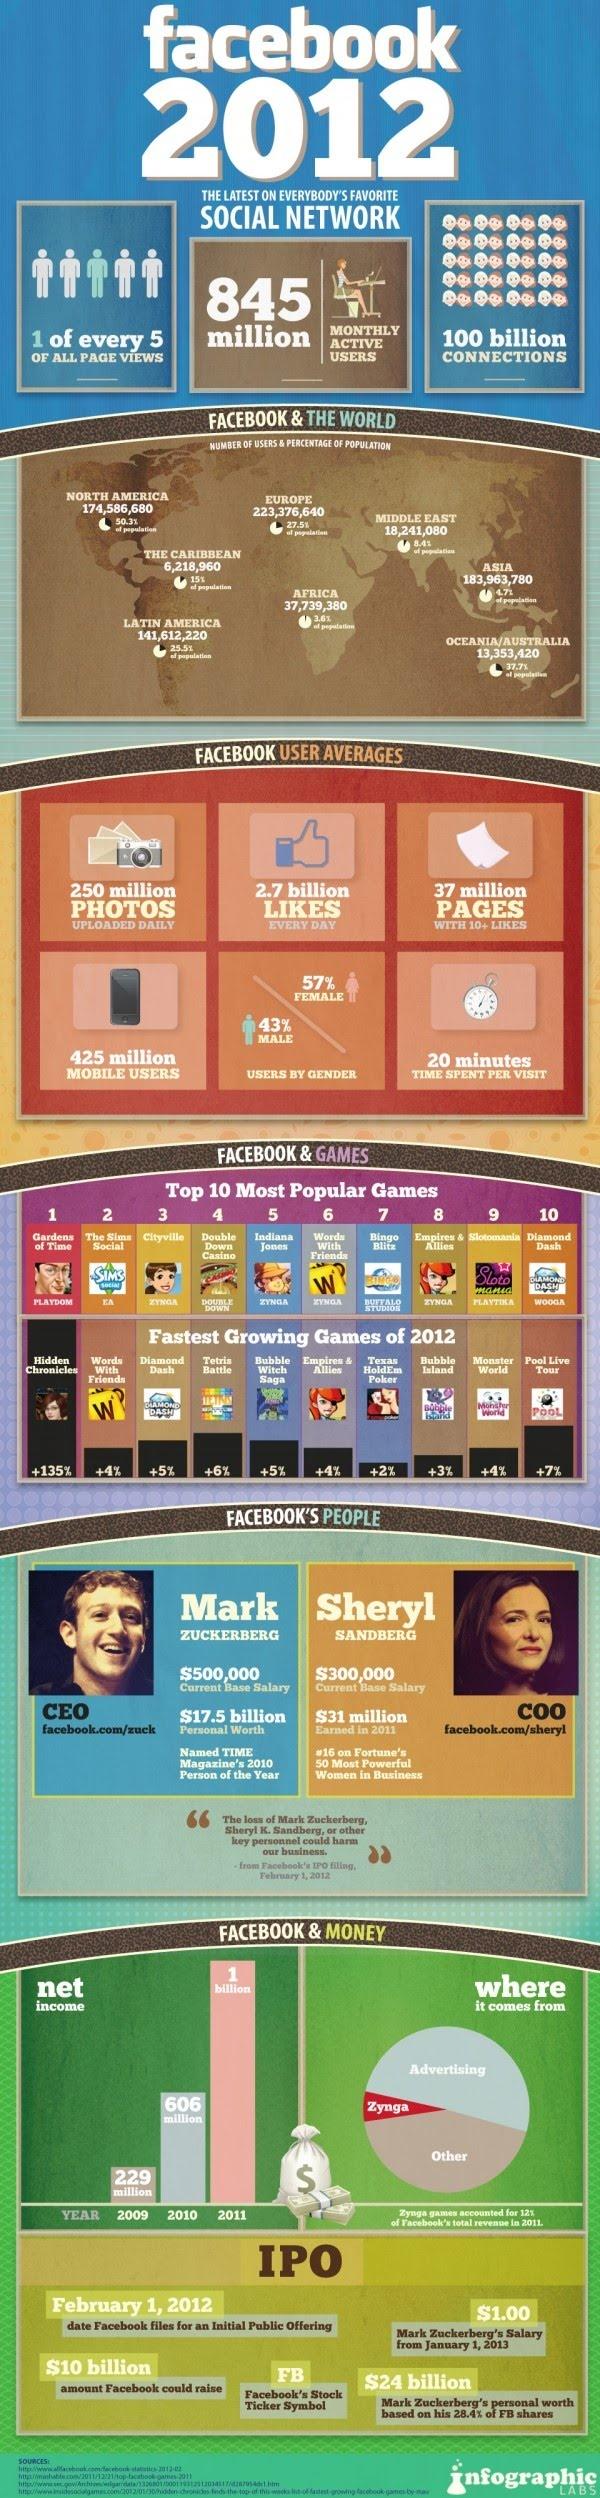 Facebook 2012 Infographic